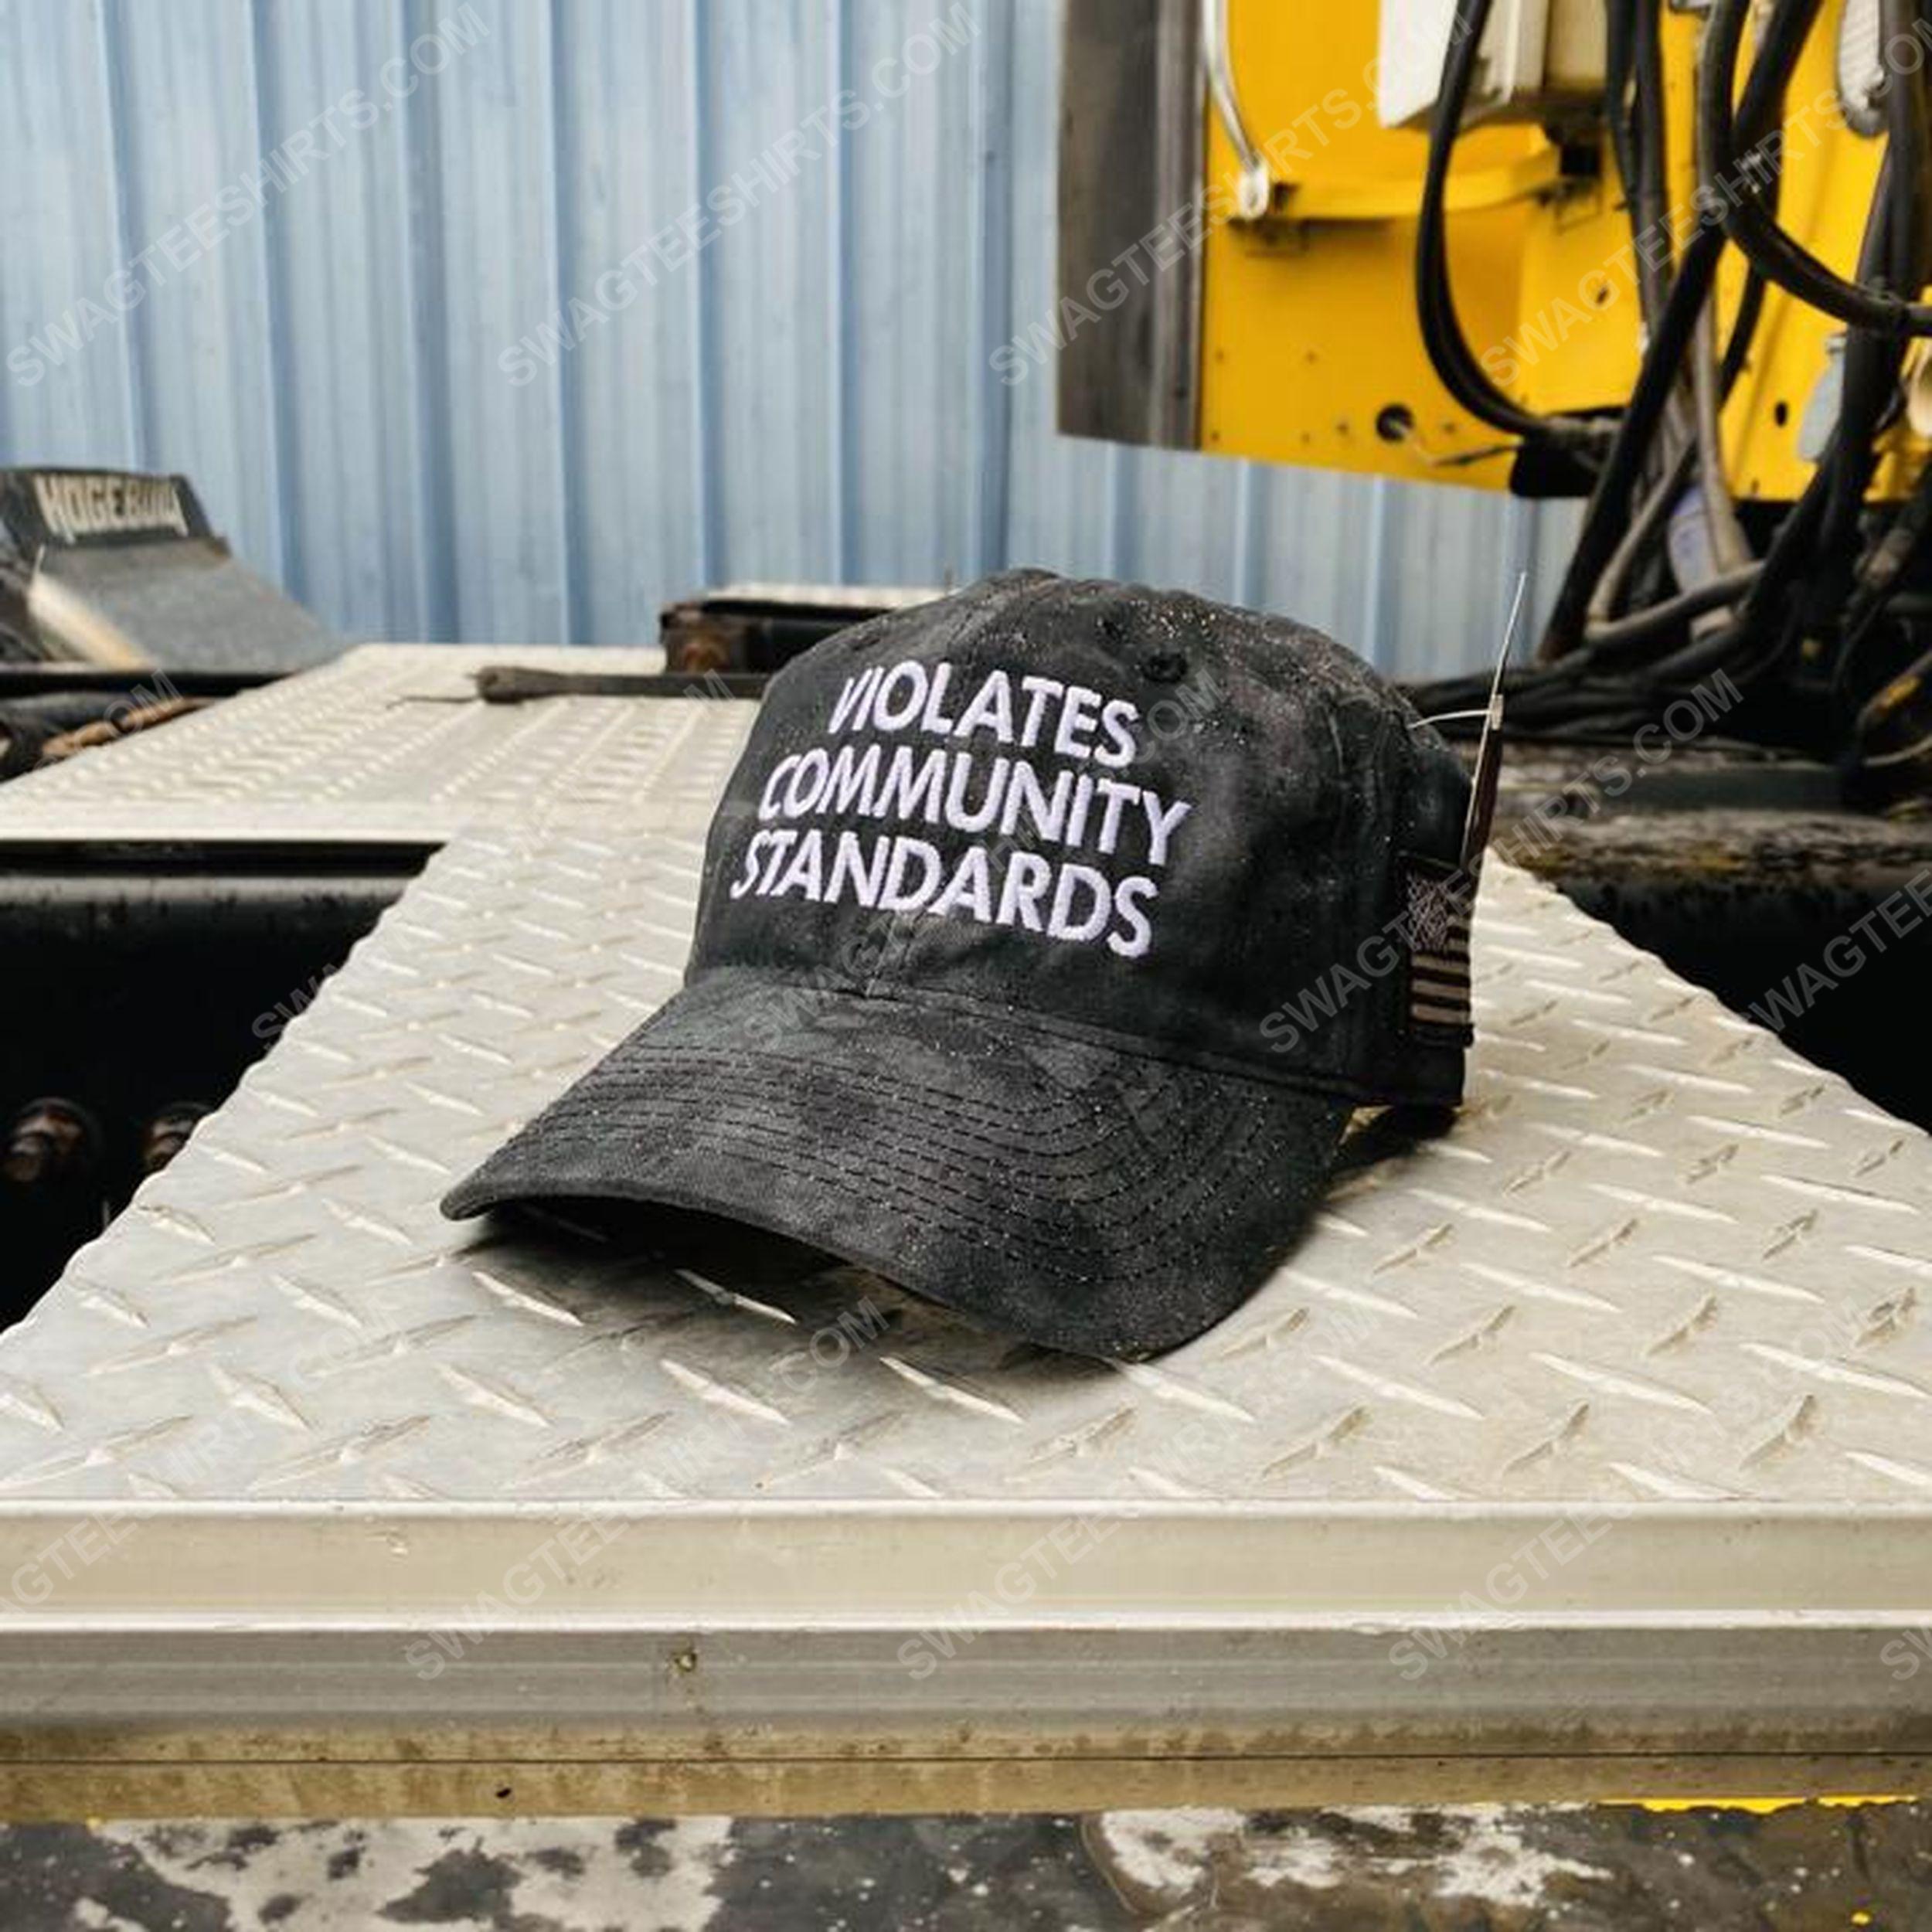 Violates community standards full print classic hat 1